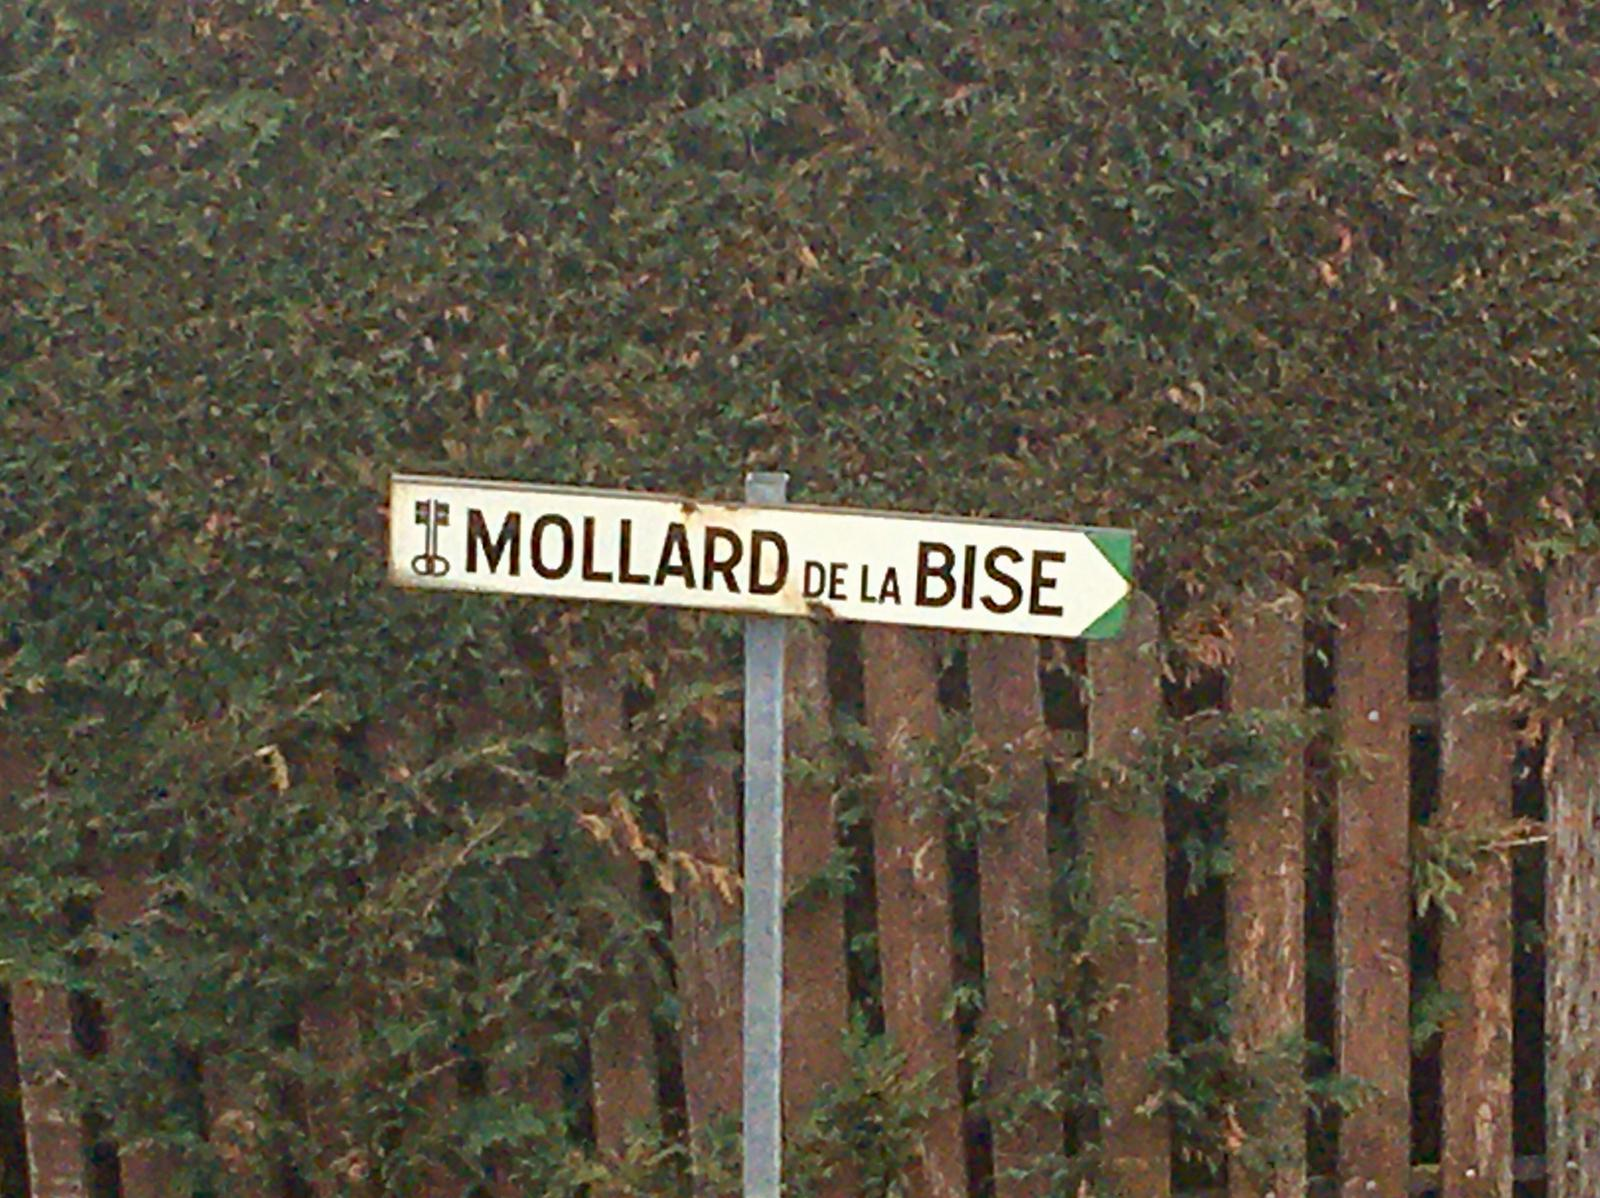 Mollard-de-la-Bise-2020-03-12-16-12-57 3